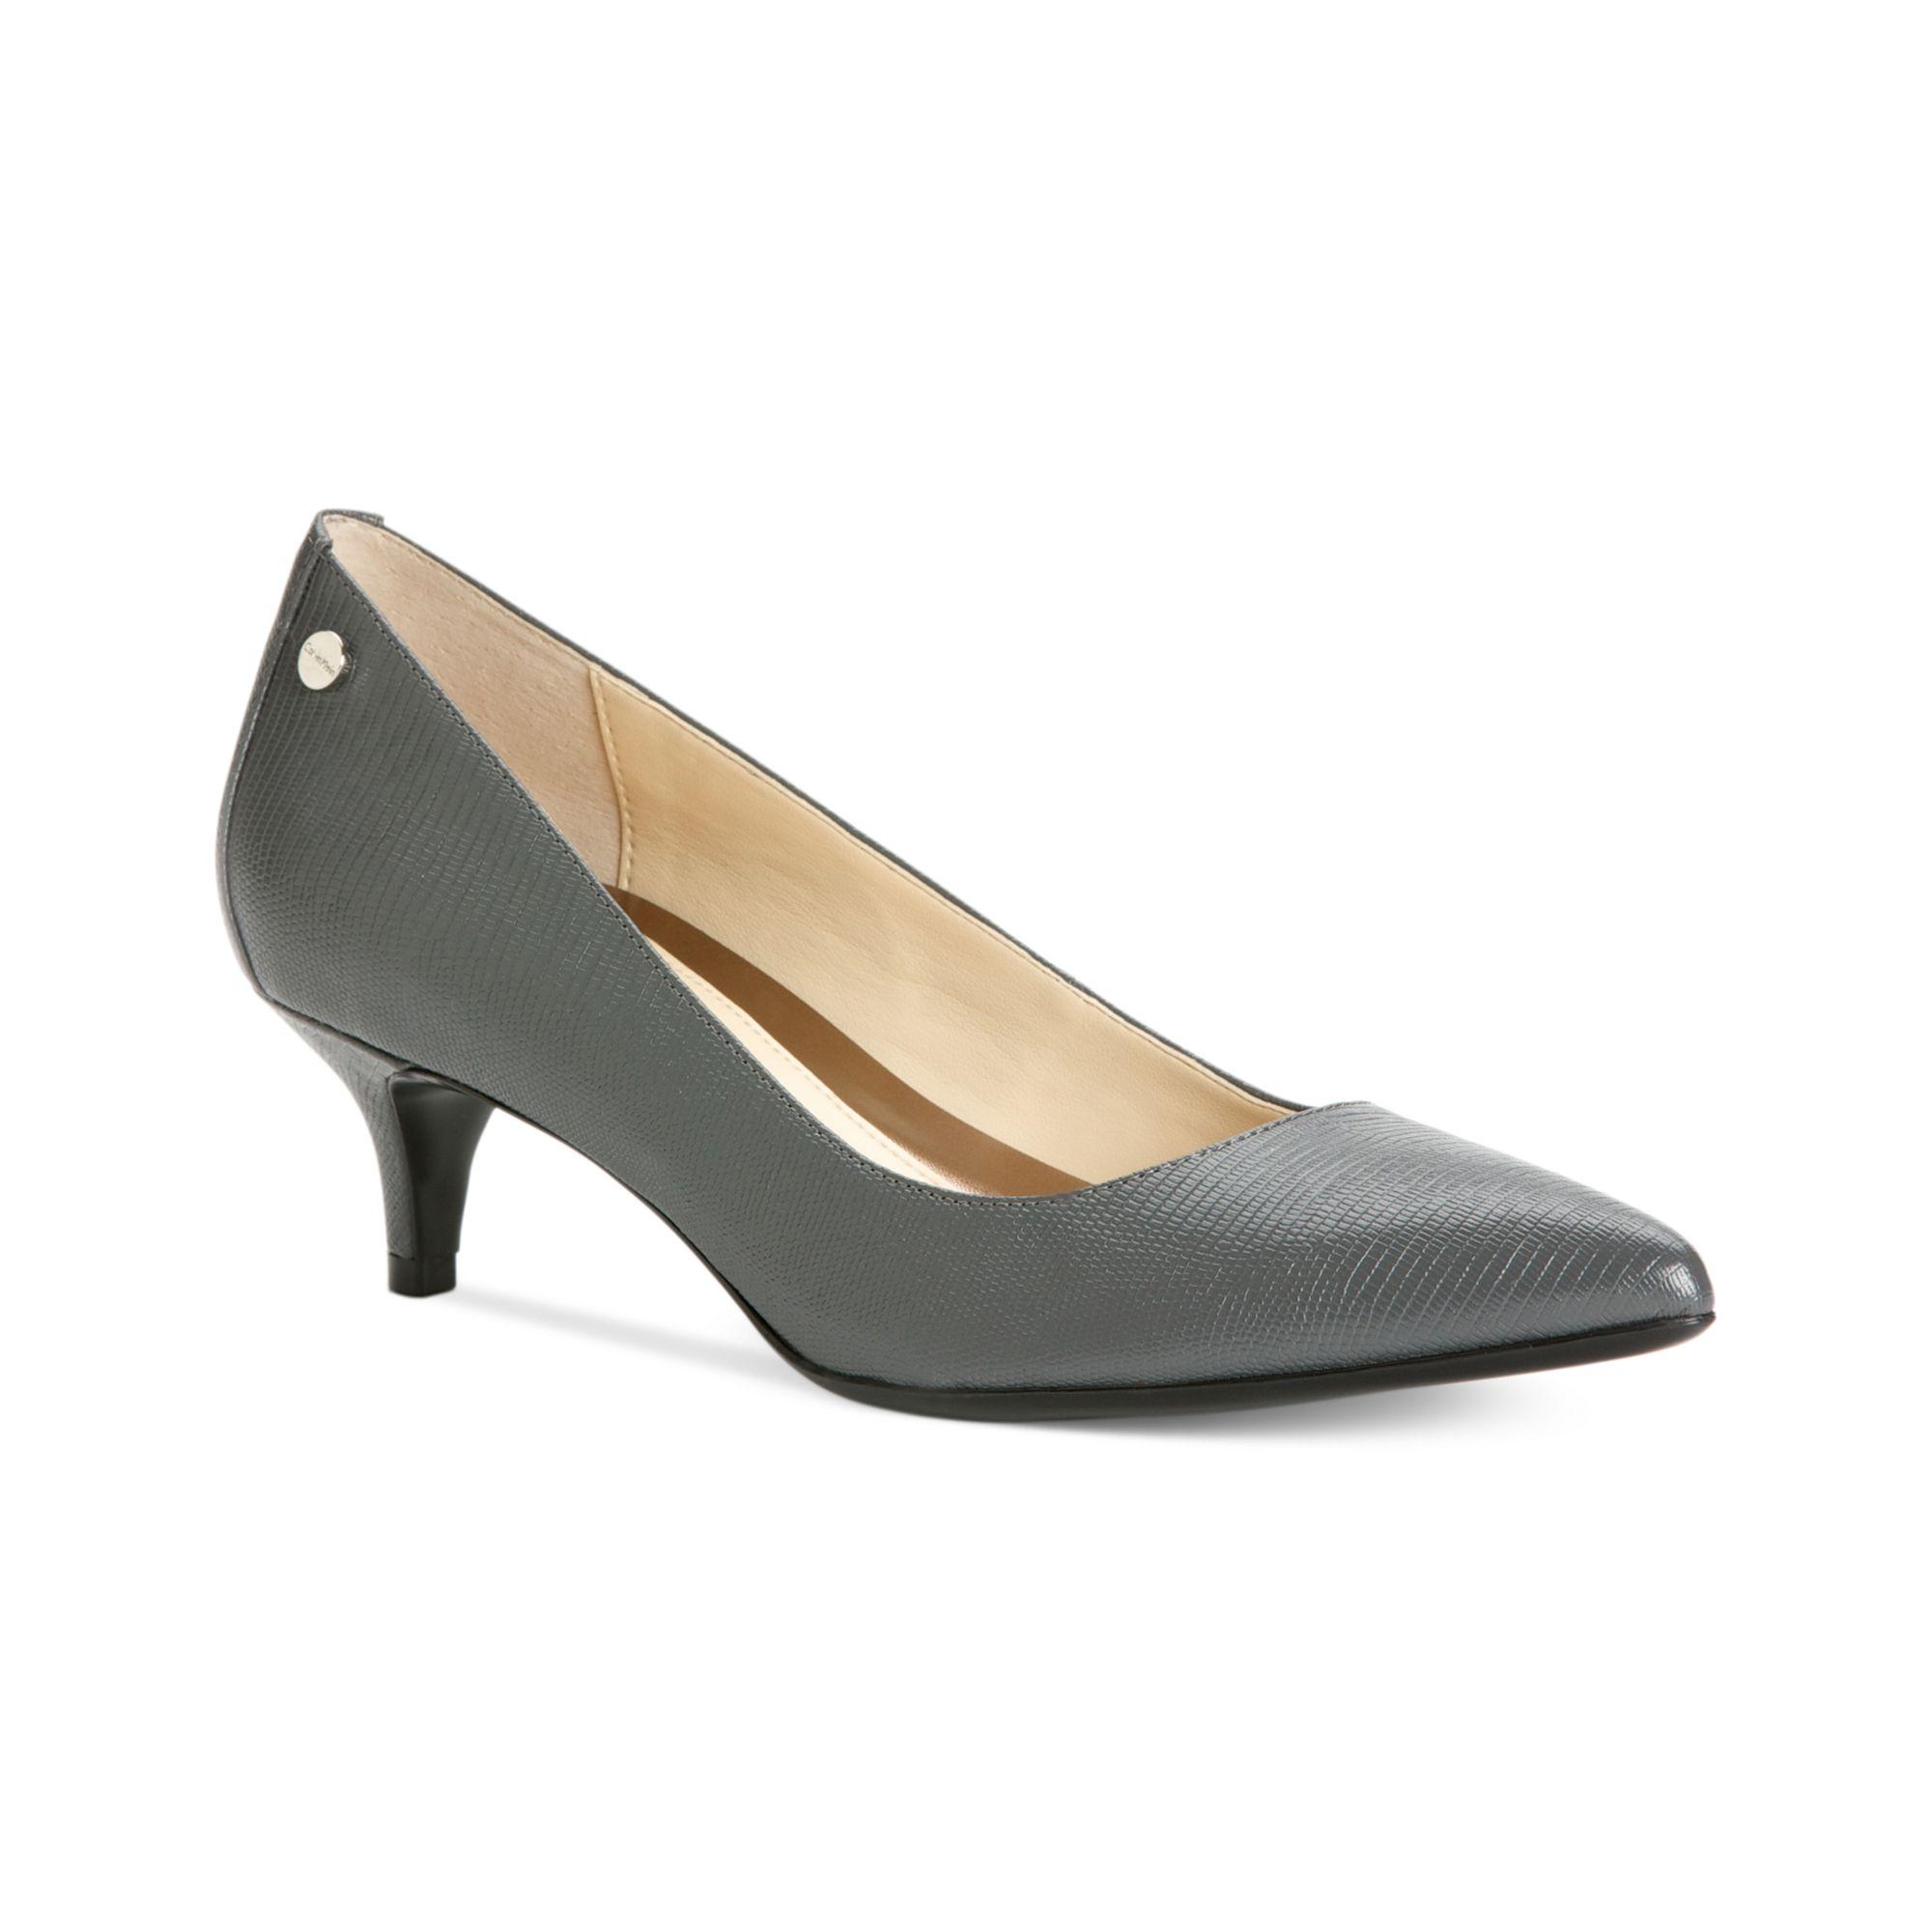 84ebe11a2ae Lyst - Calvin Klein Nicki Kitten Heel Pumps in Gray